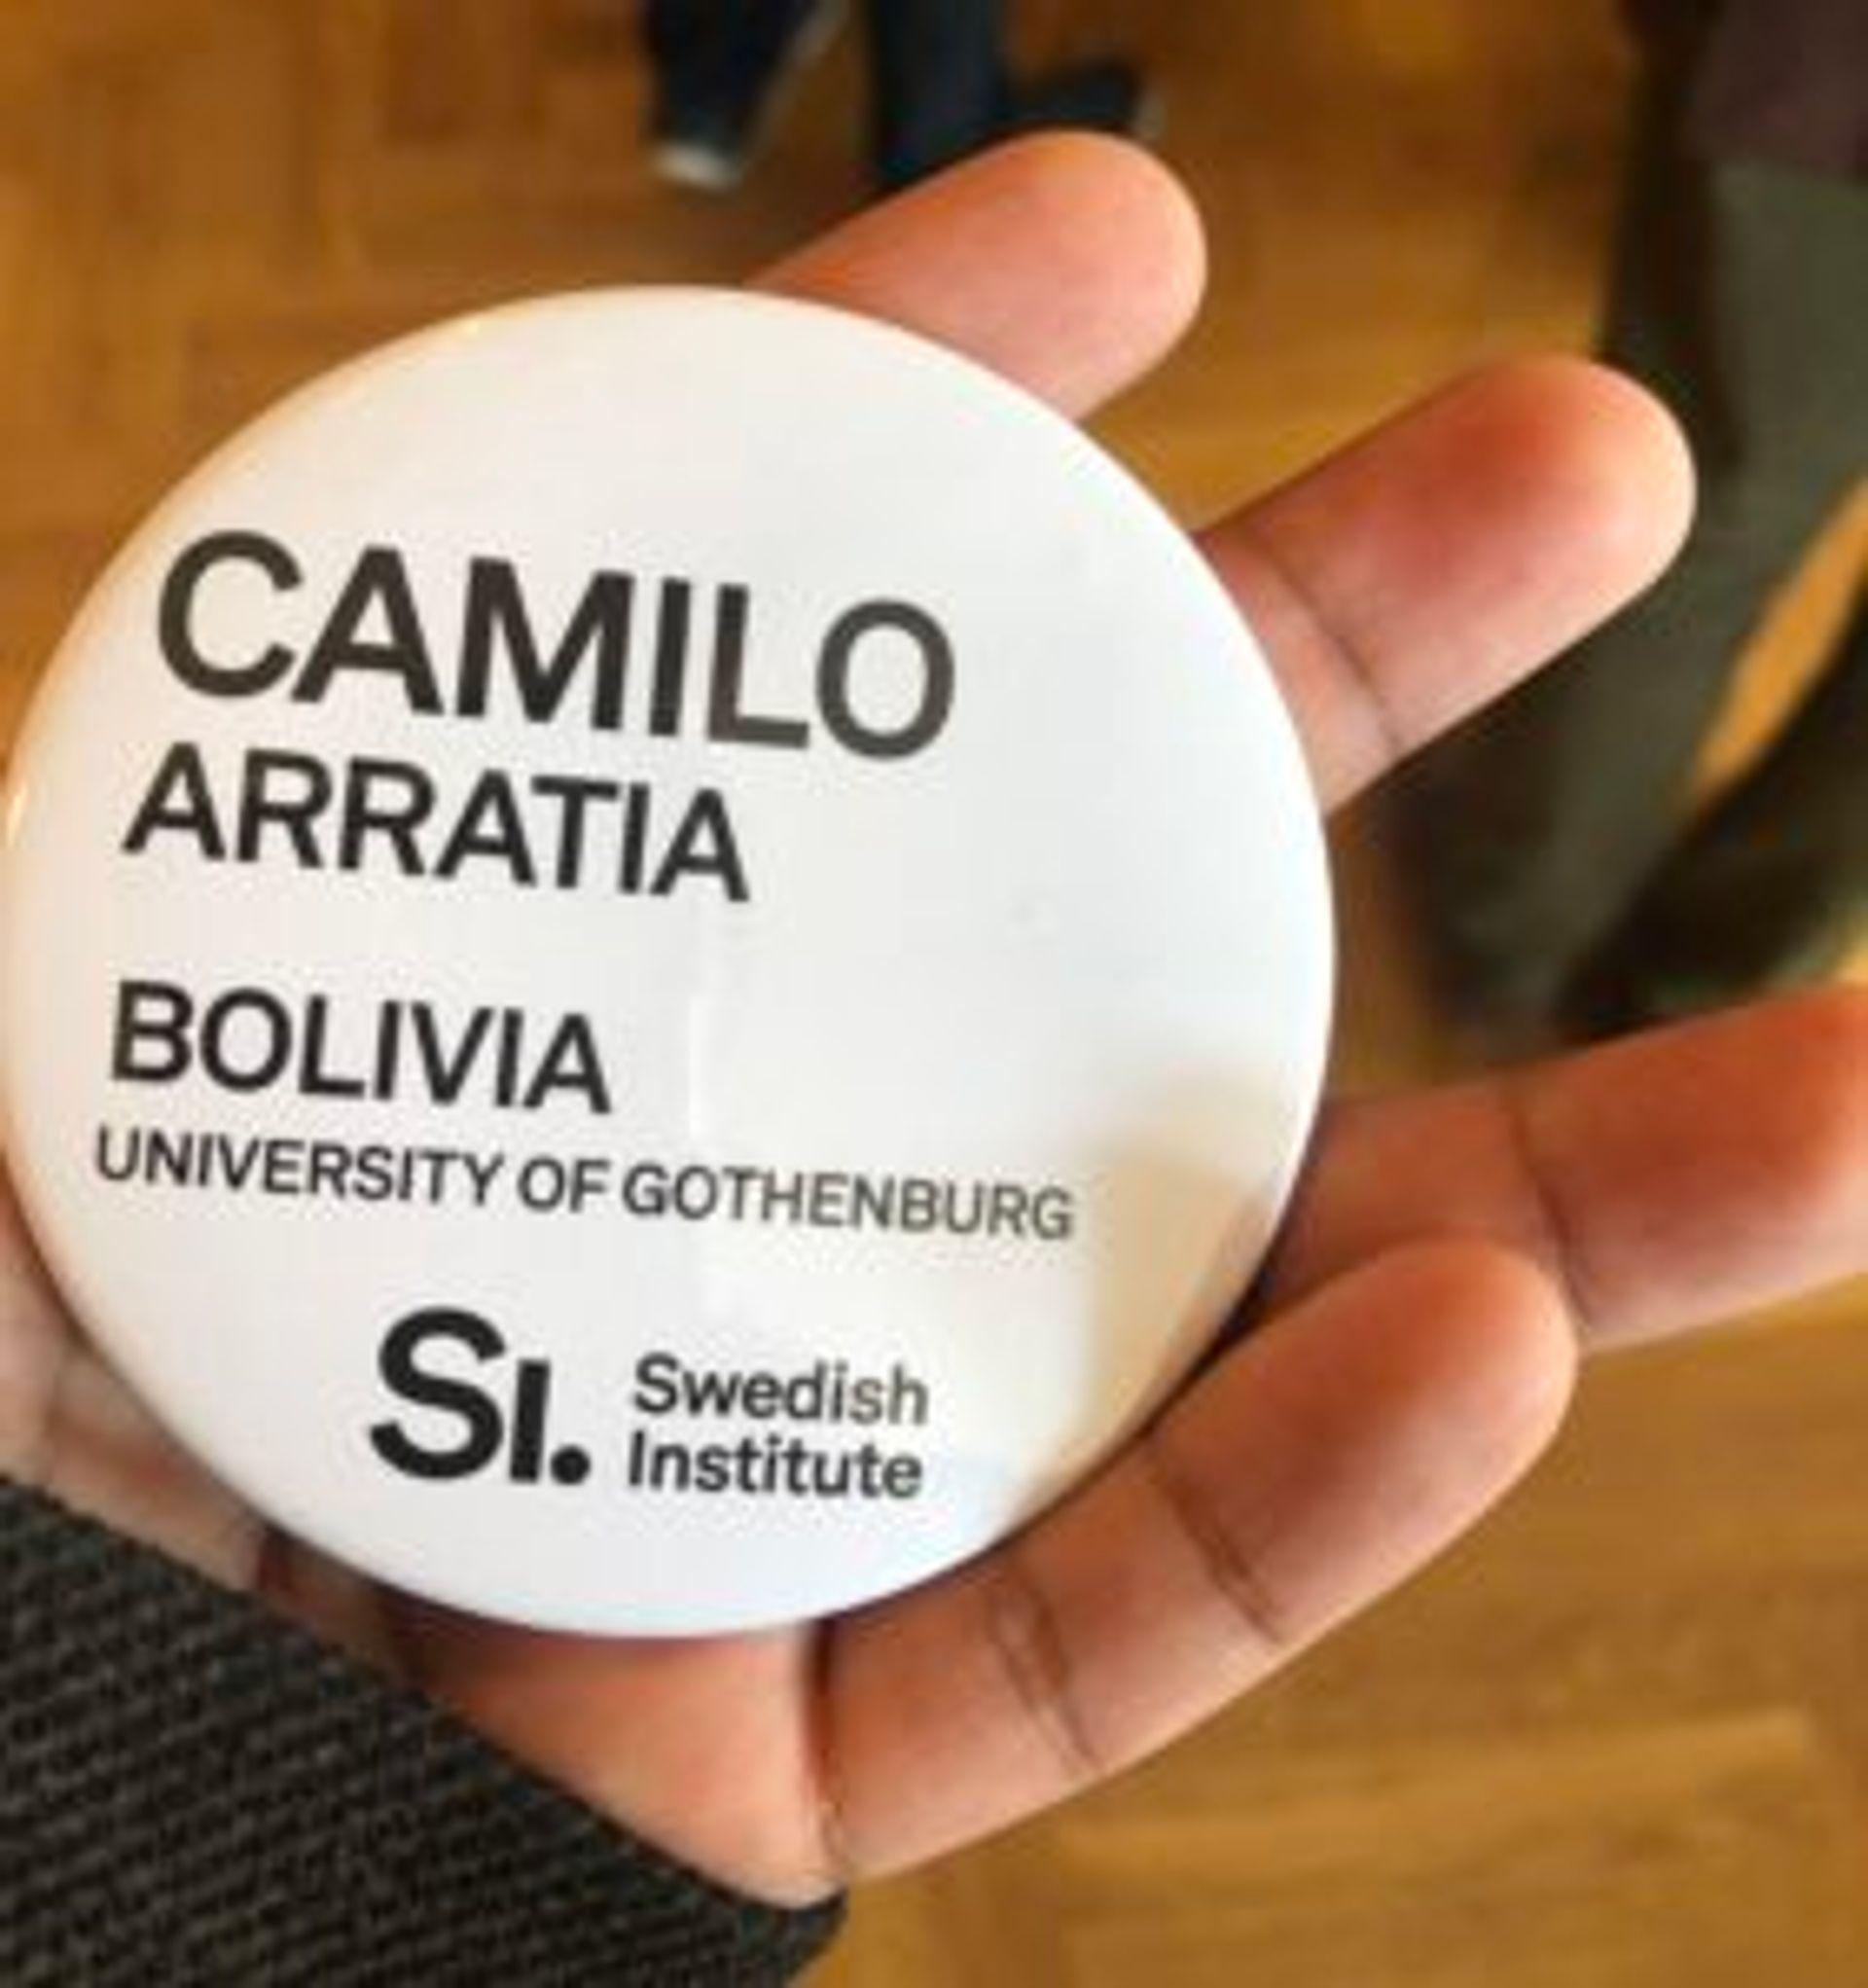 A white, round badge with the text 'Camilo Arratia. Bolivia. University of Gothenburg.' on it.